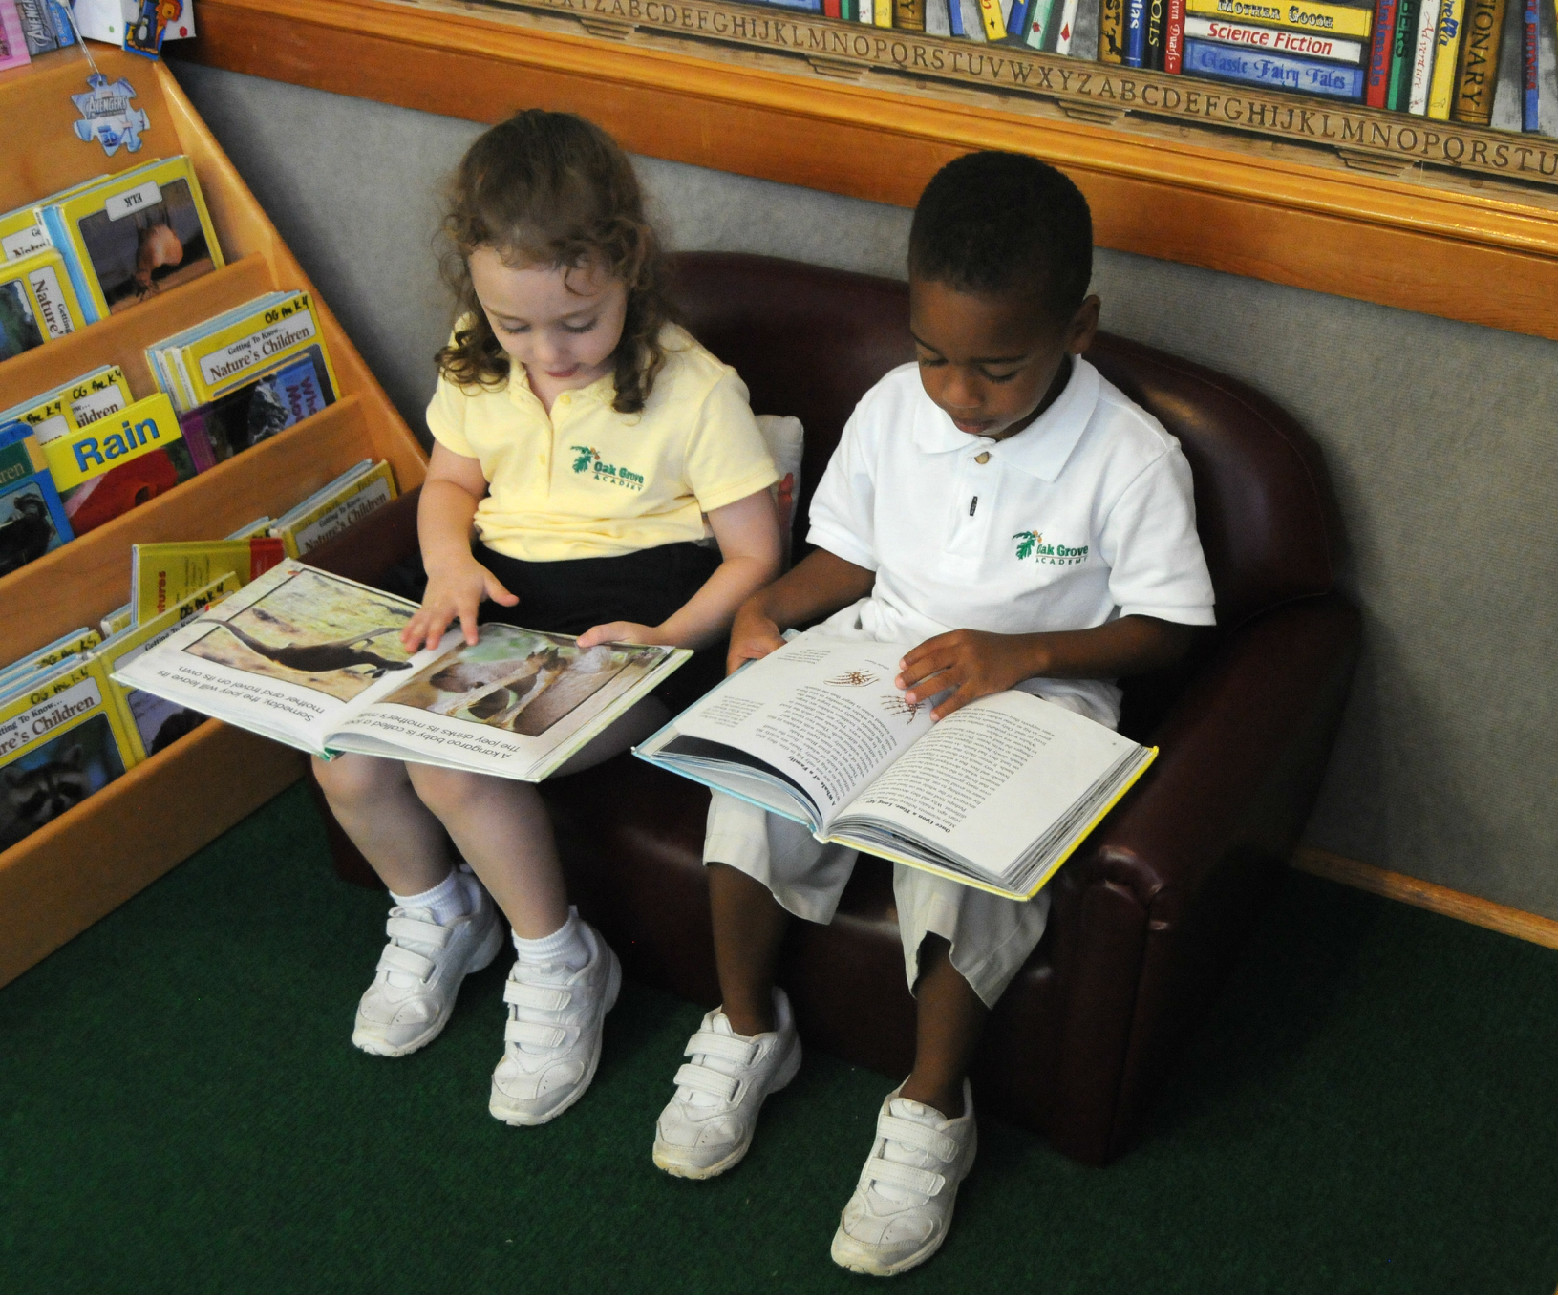 oak grove preschool advanced child development programs include in 214